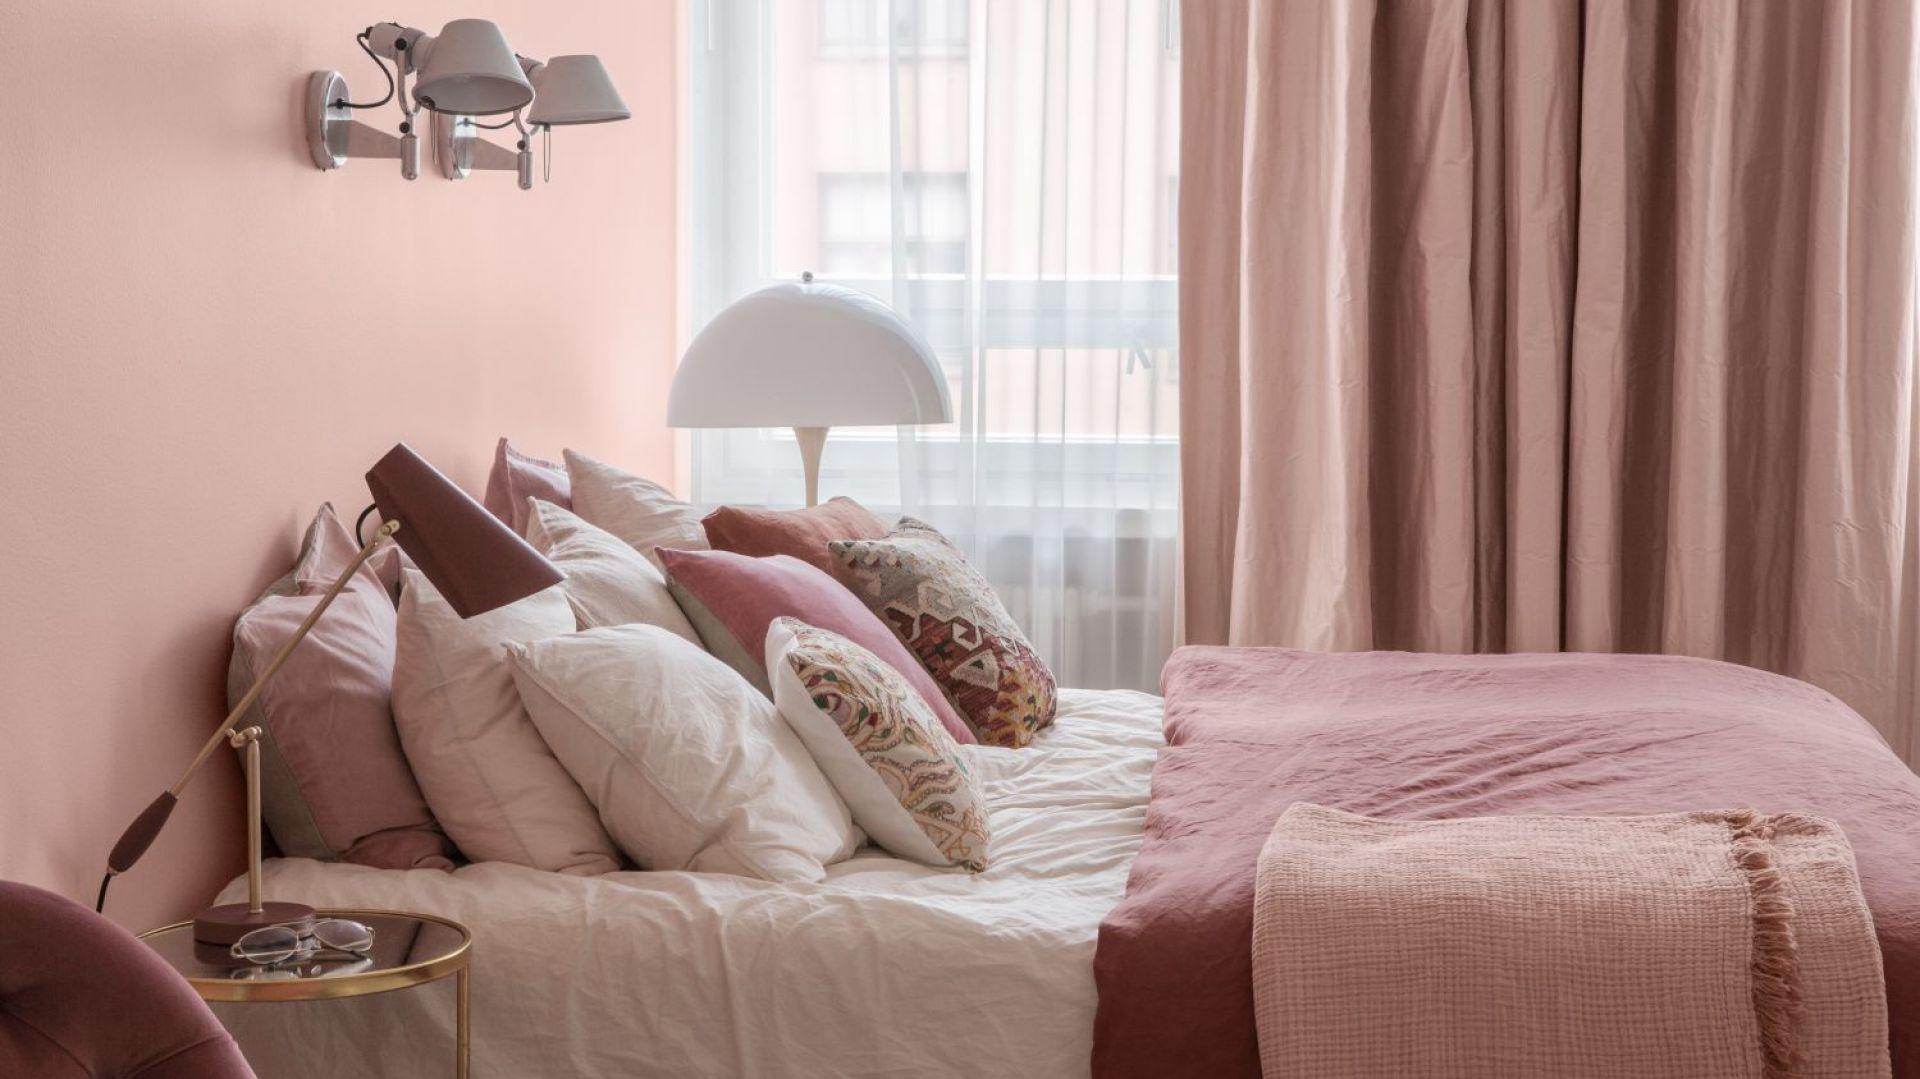 Wnętrza w stylu total look: farba Tikkurila Color Now 2019, kolor H320 Magnolia. Fot. Tikkurila